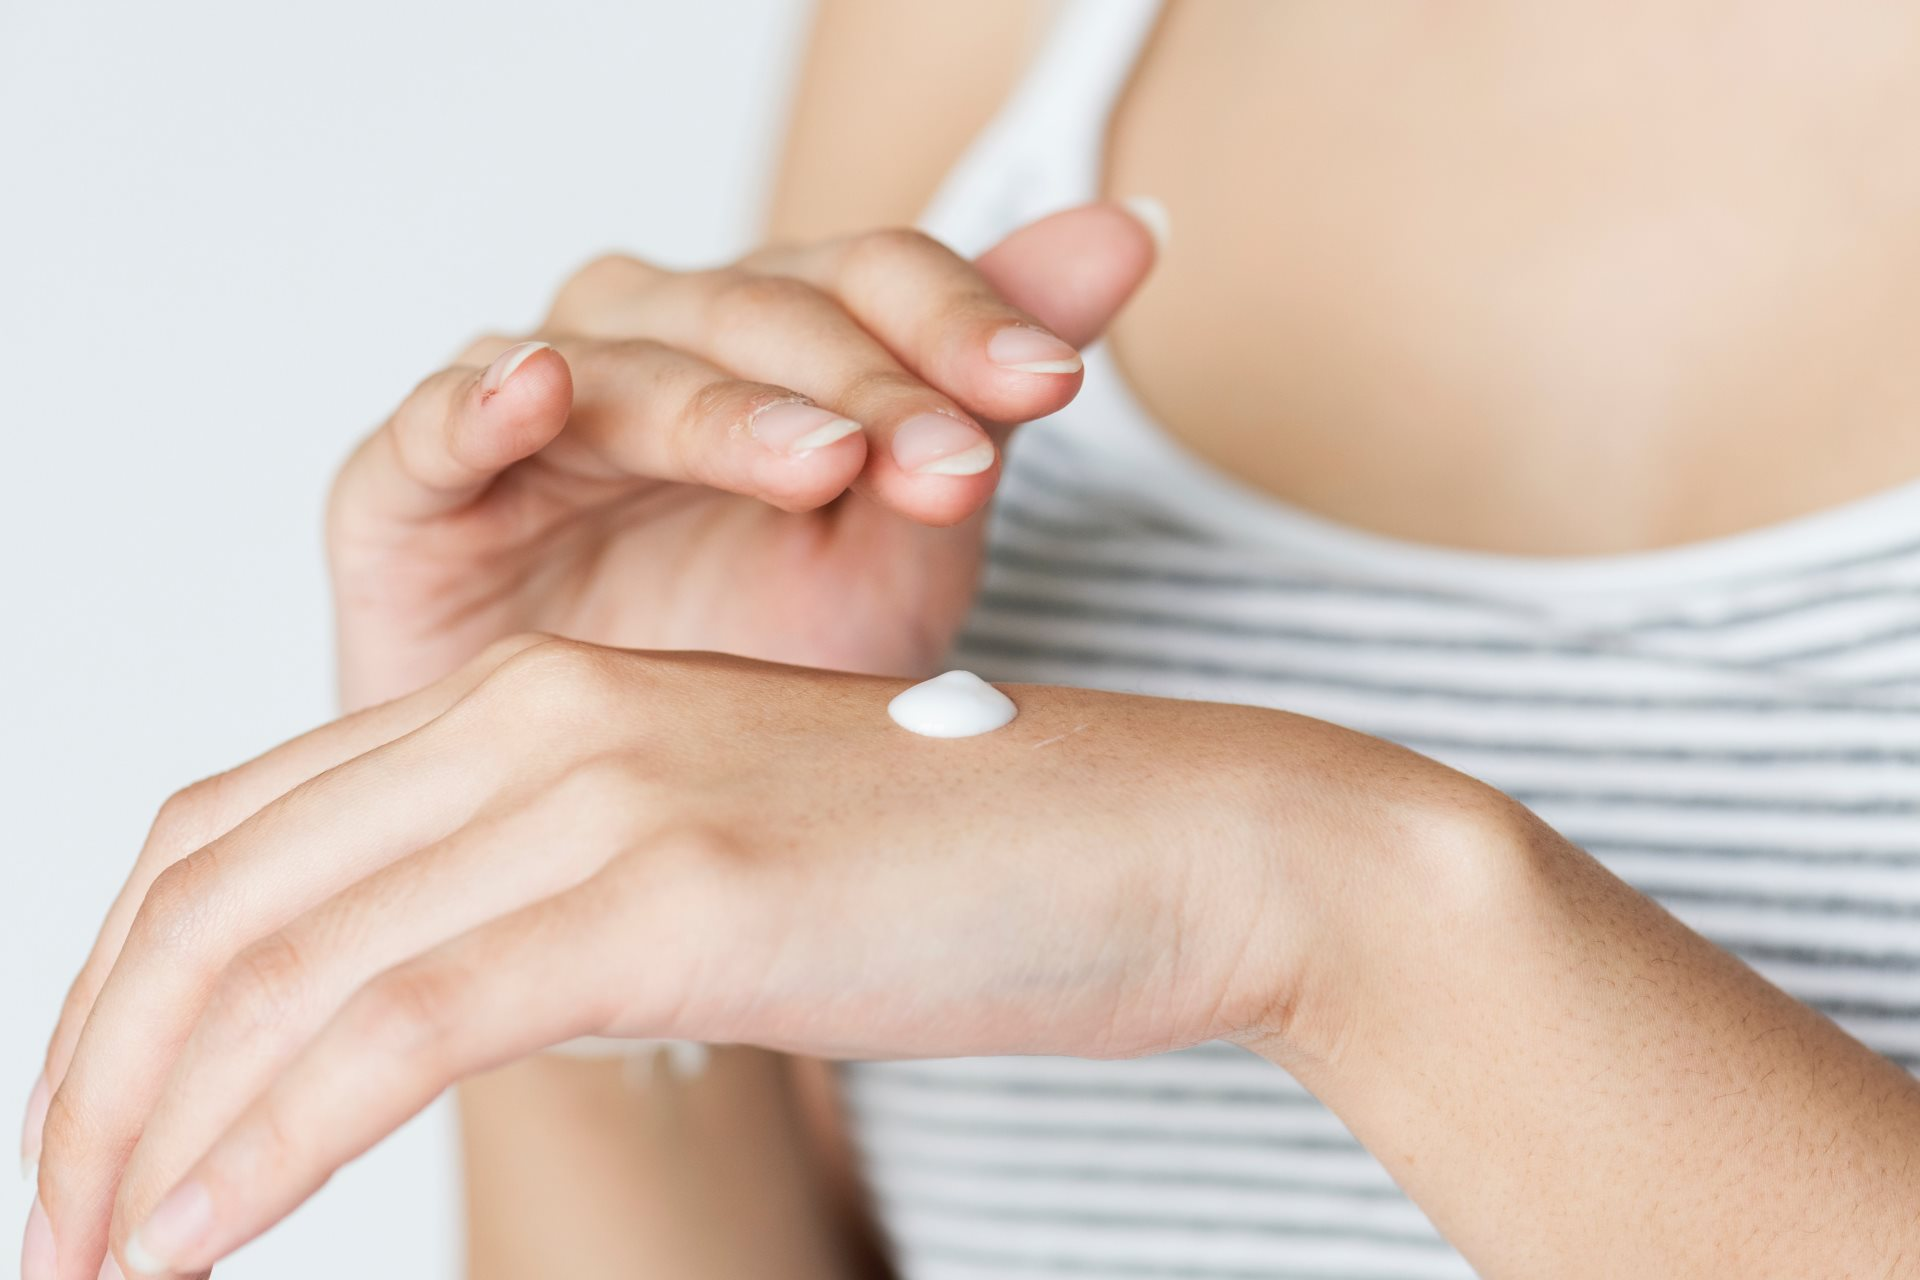 Moisturizing Skin to Reduce Wrinkles